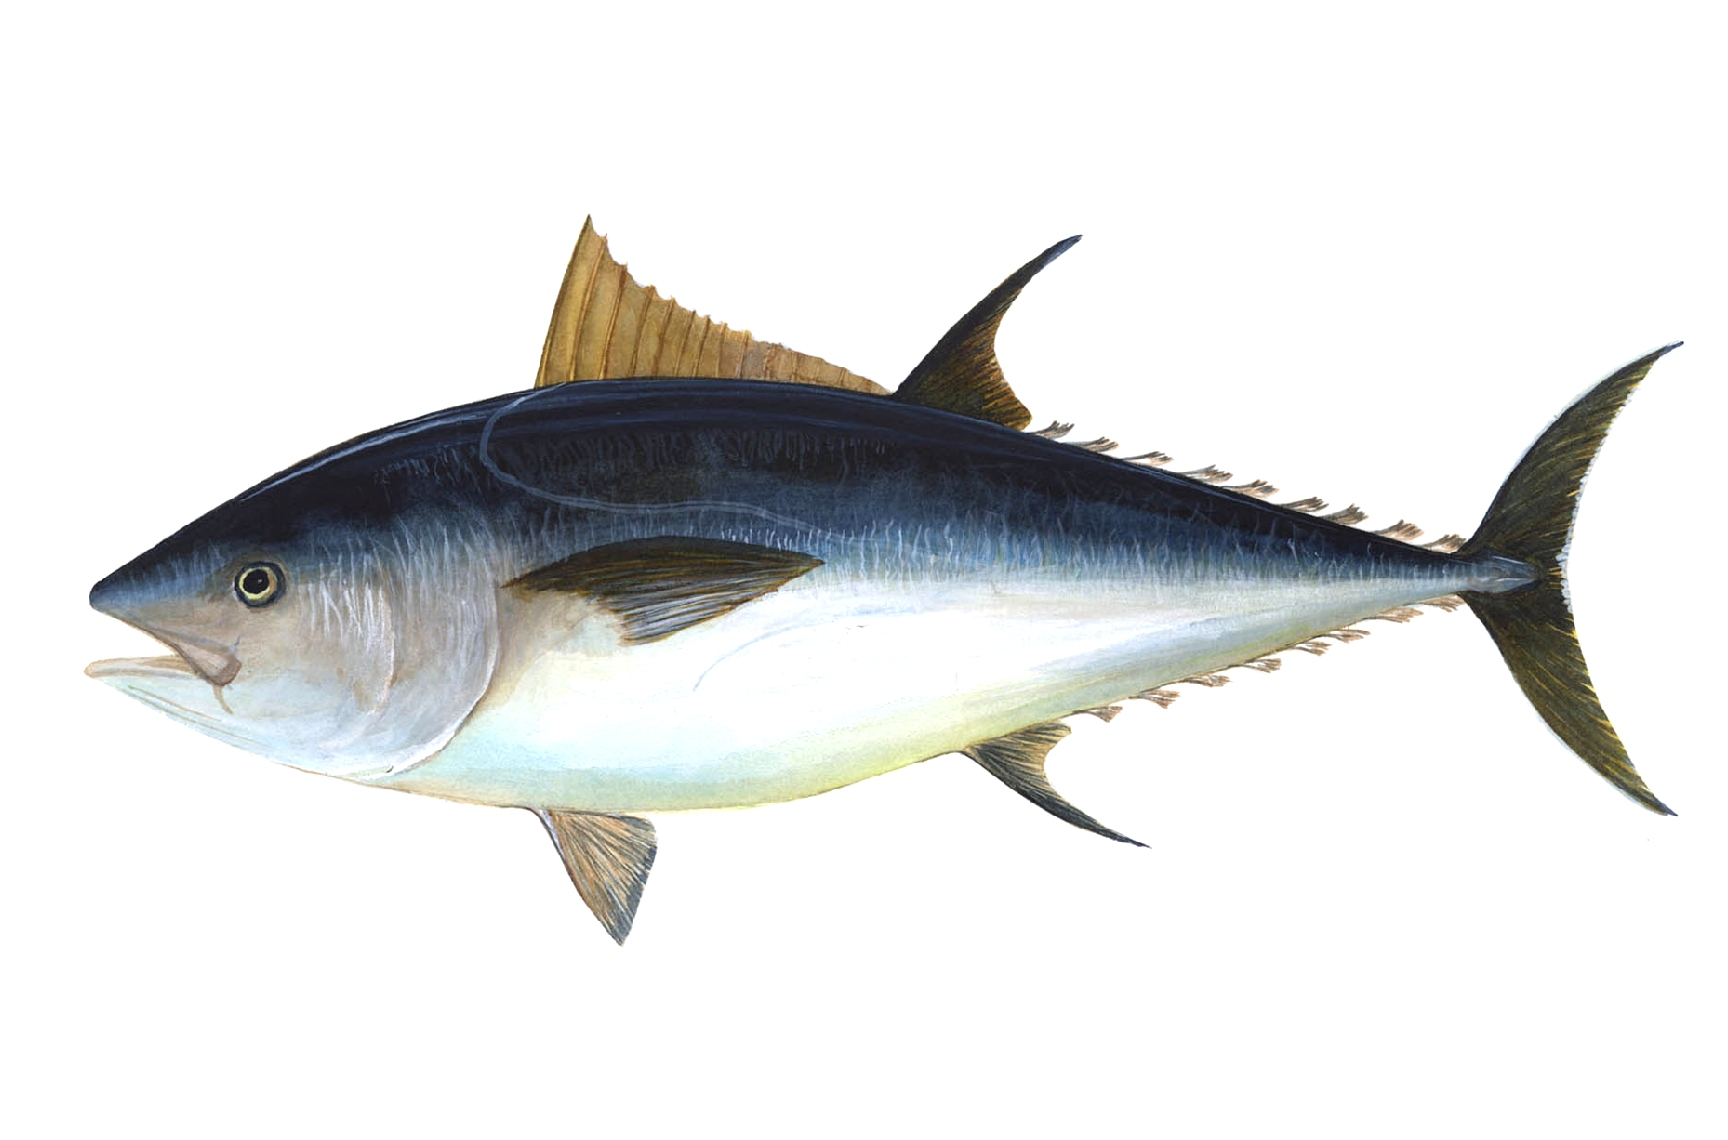 Blåfenad tonfisk – en rödlistad art